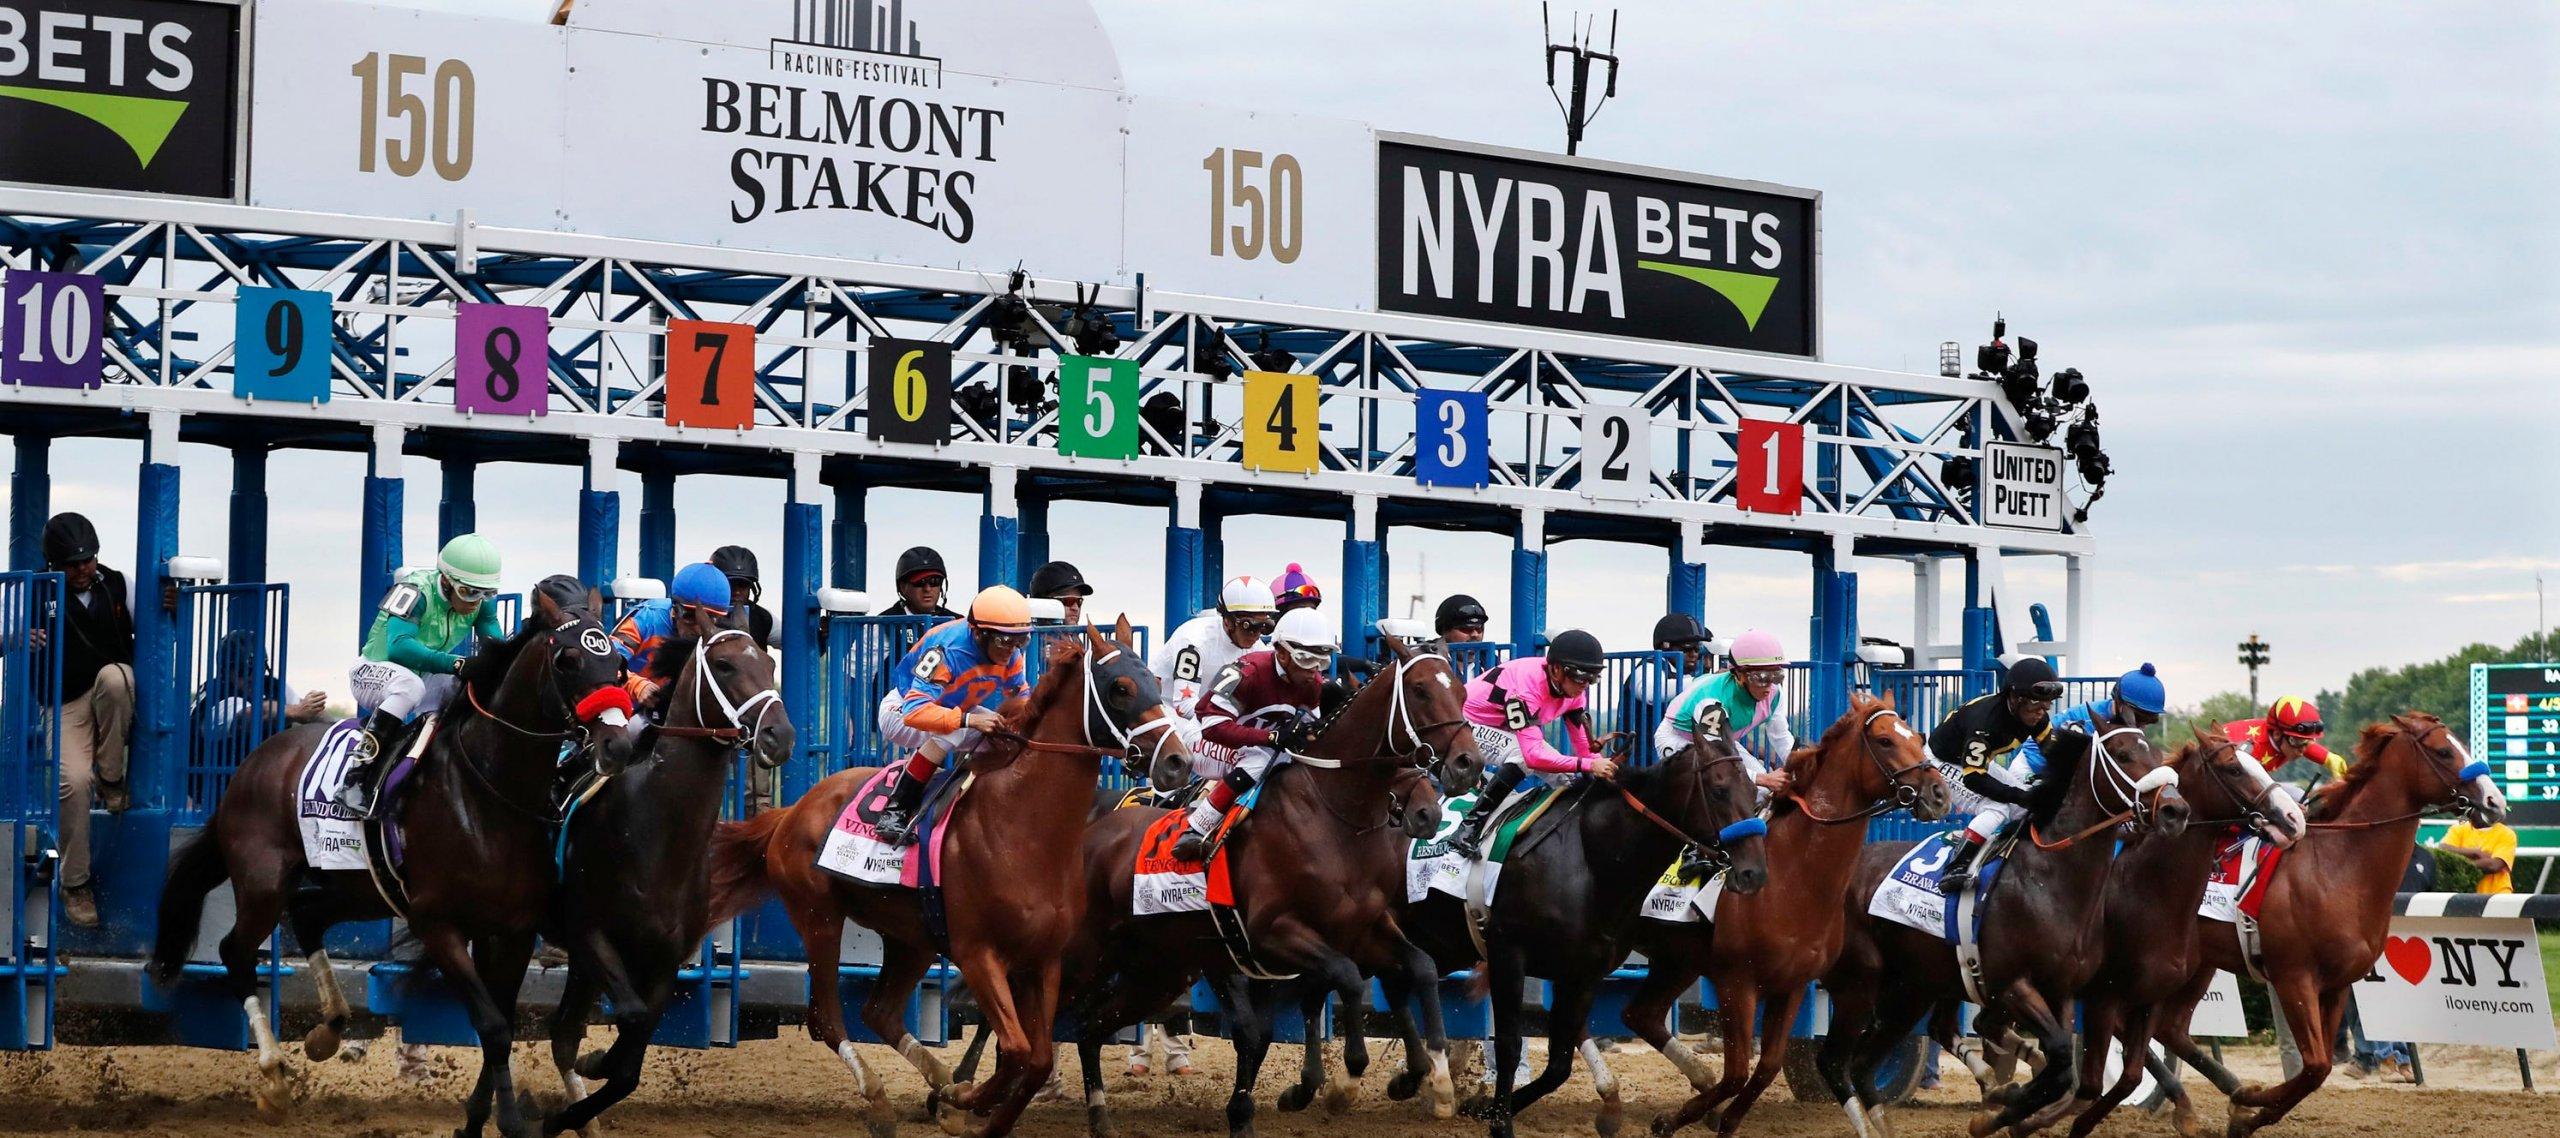 2020 Belmont Stakes Odds & Free Picks